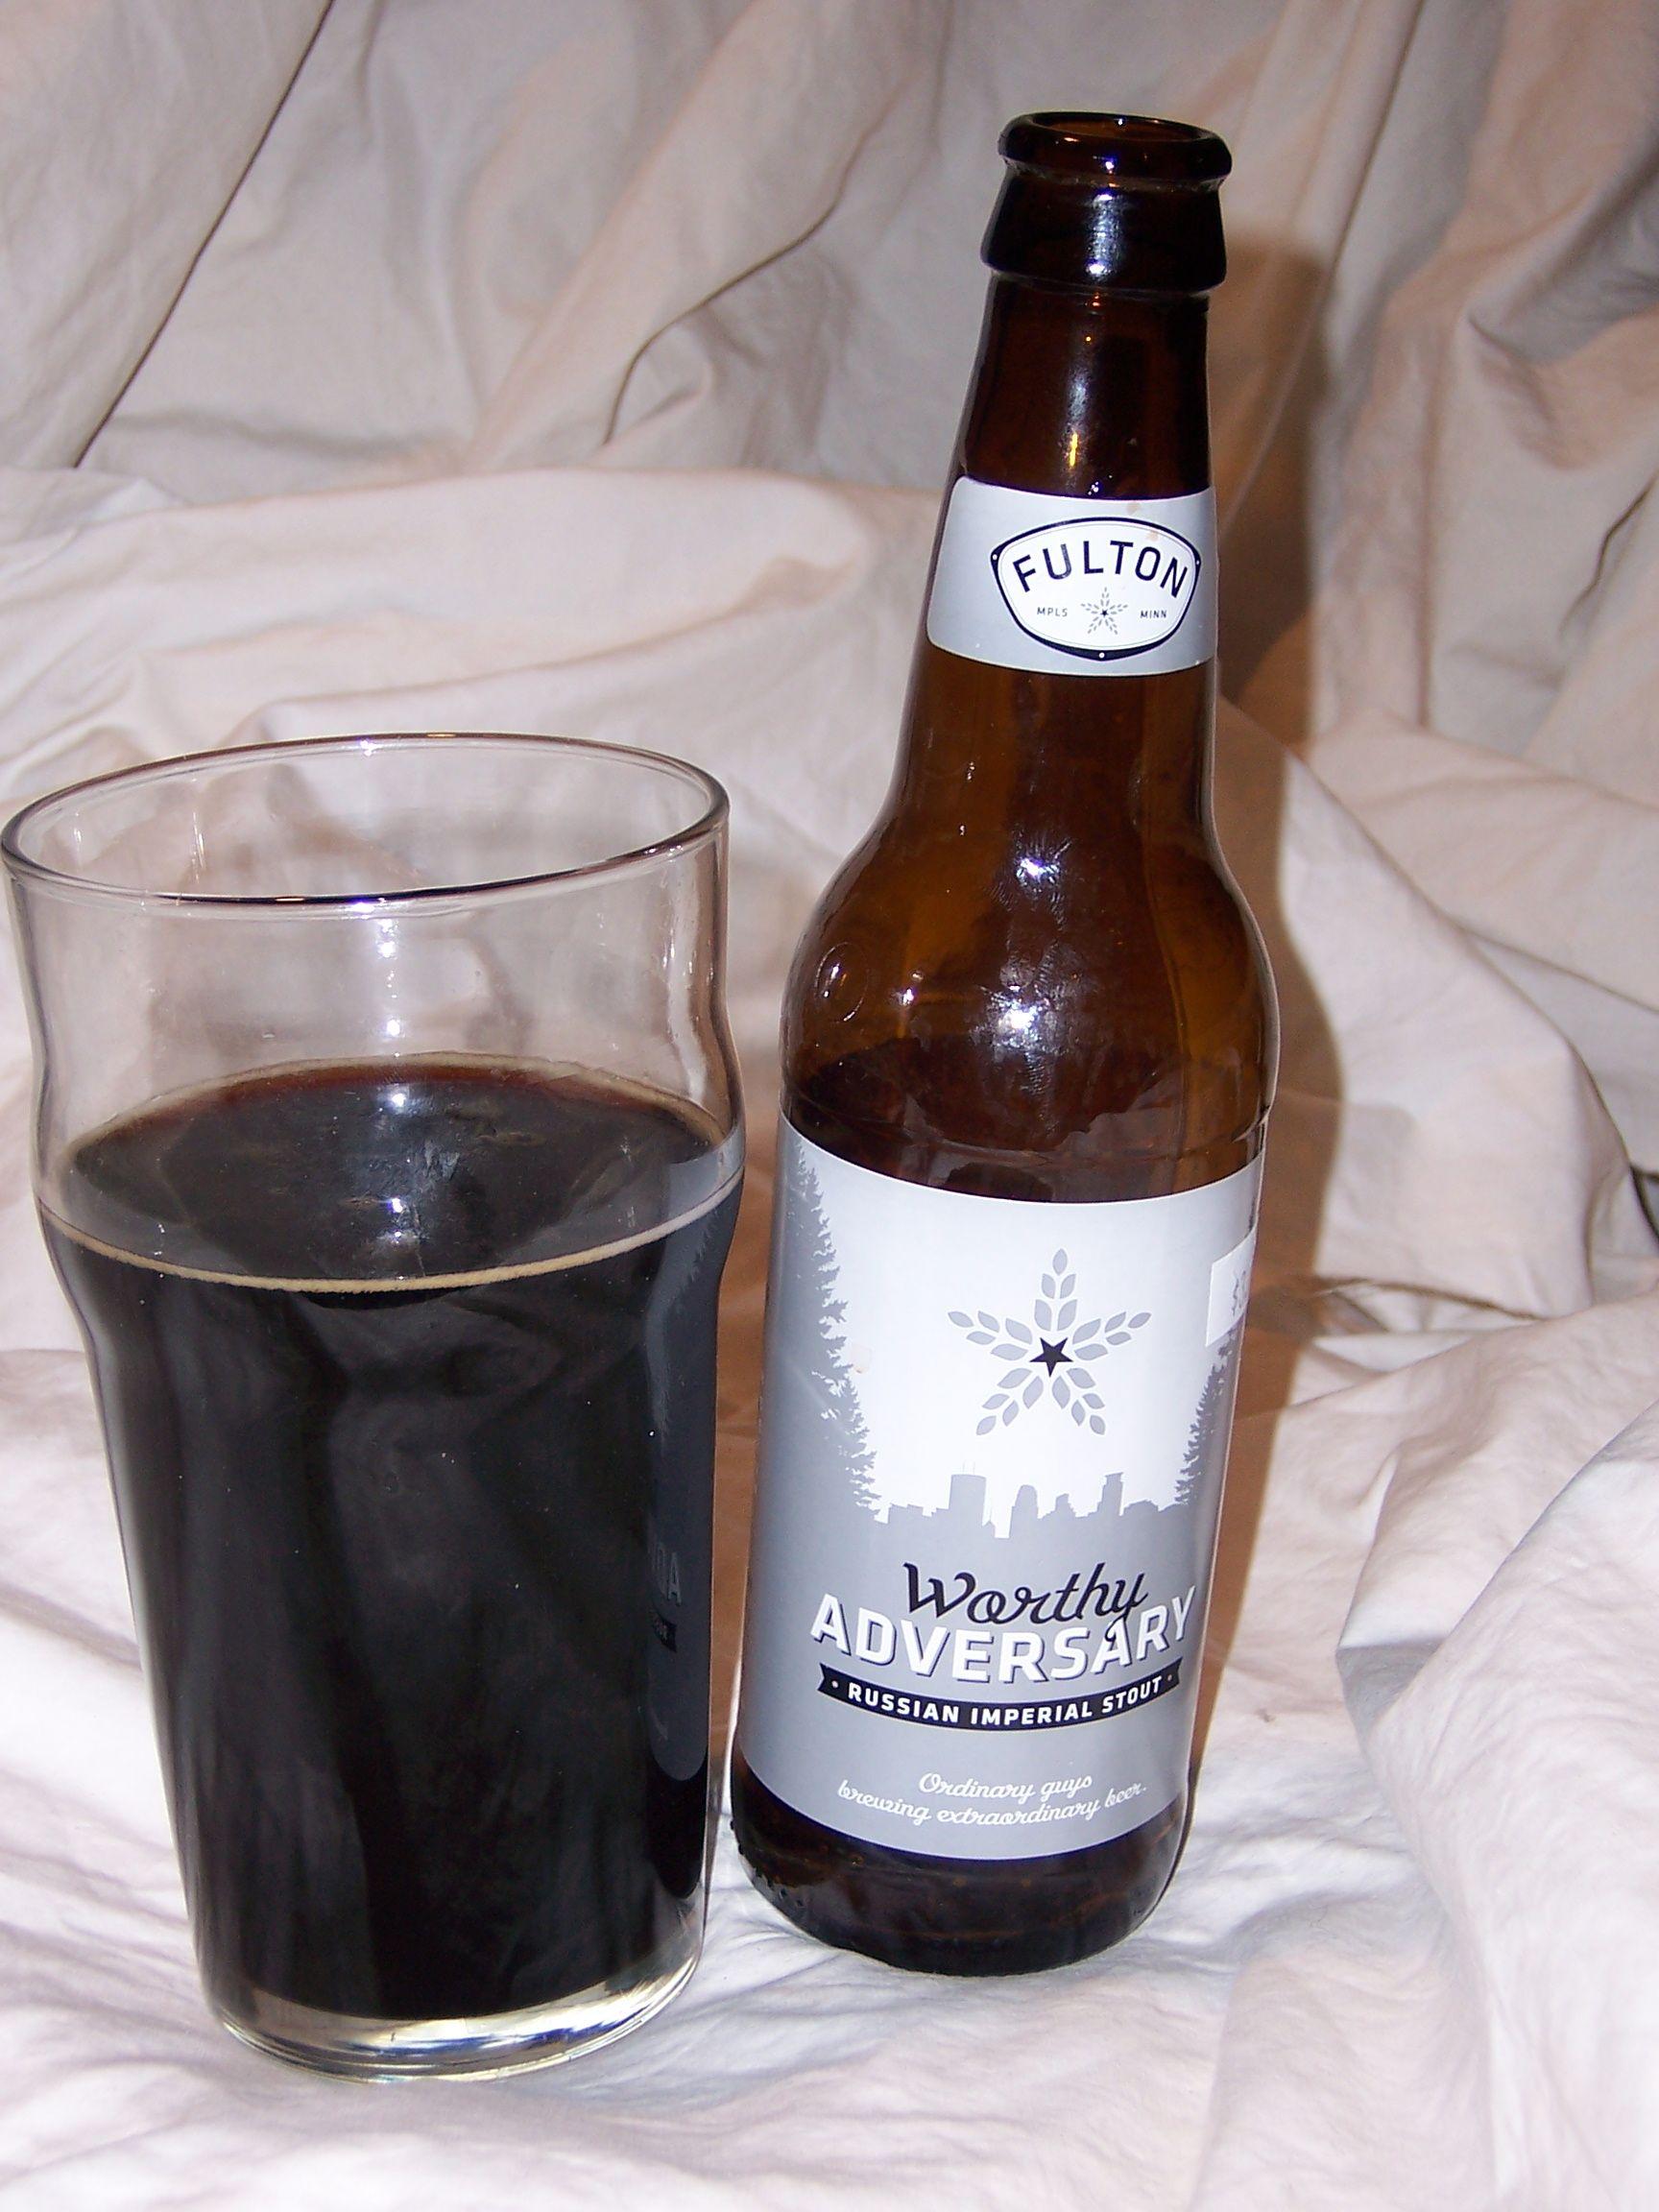 A Favorite. (With images) Liquor store, Beer bottle, Bottle